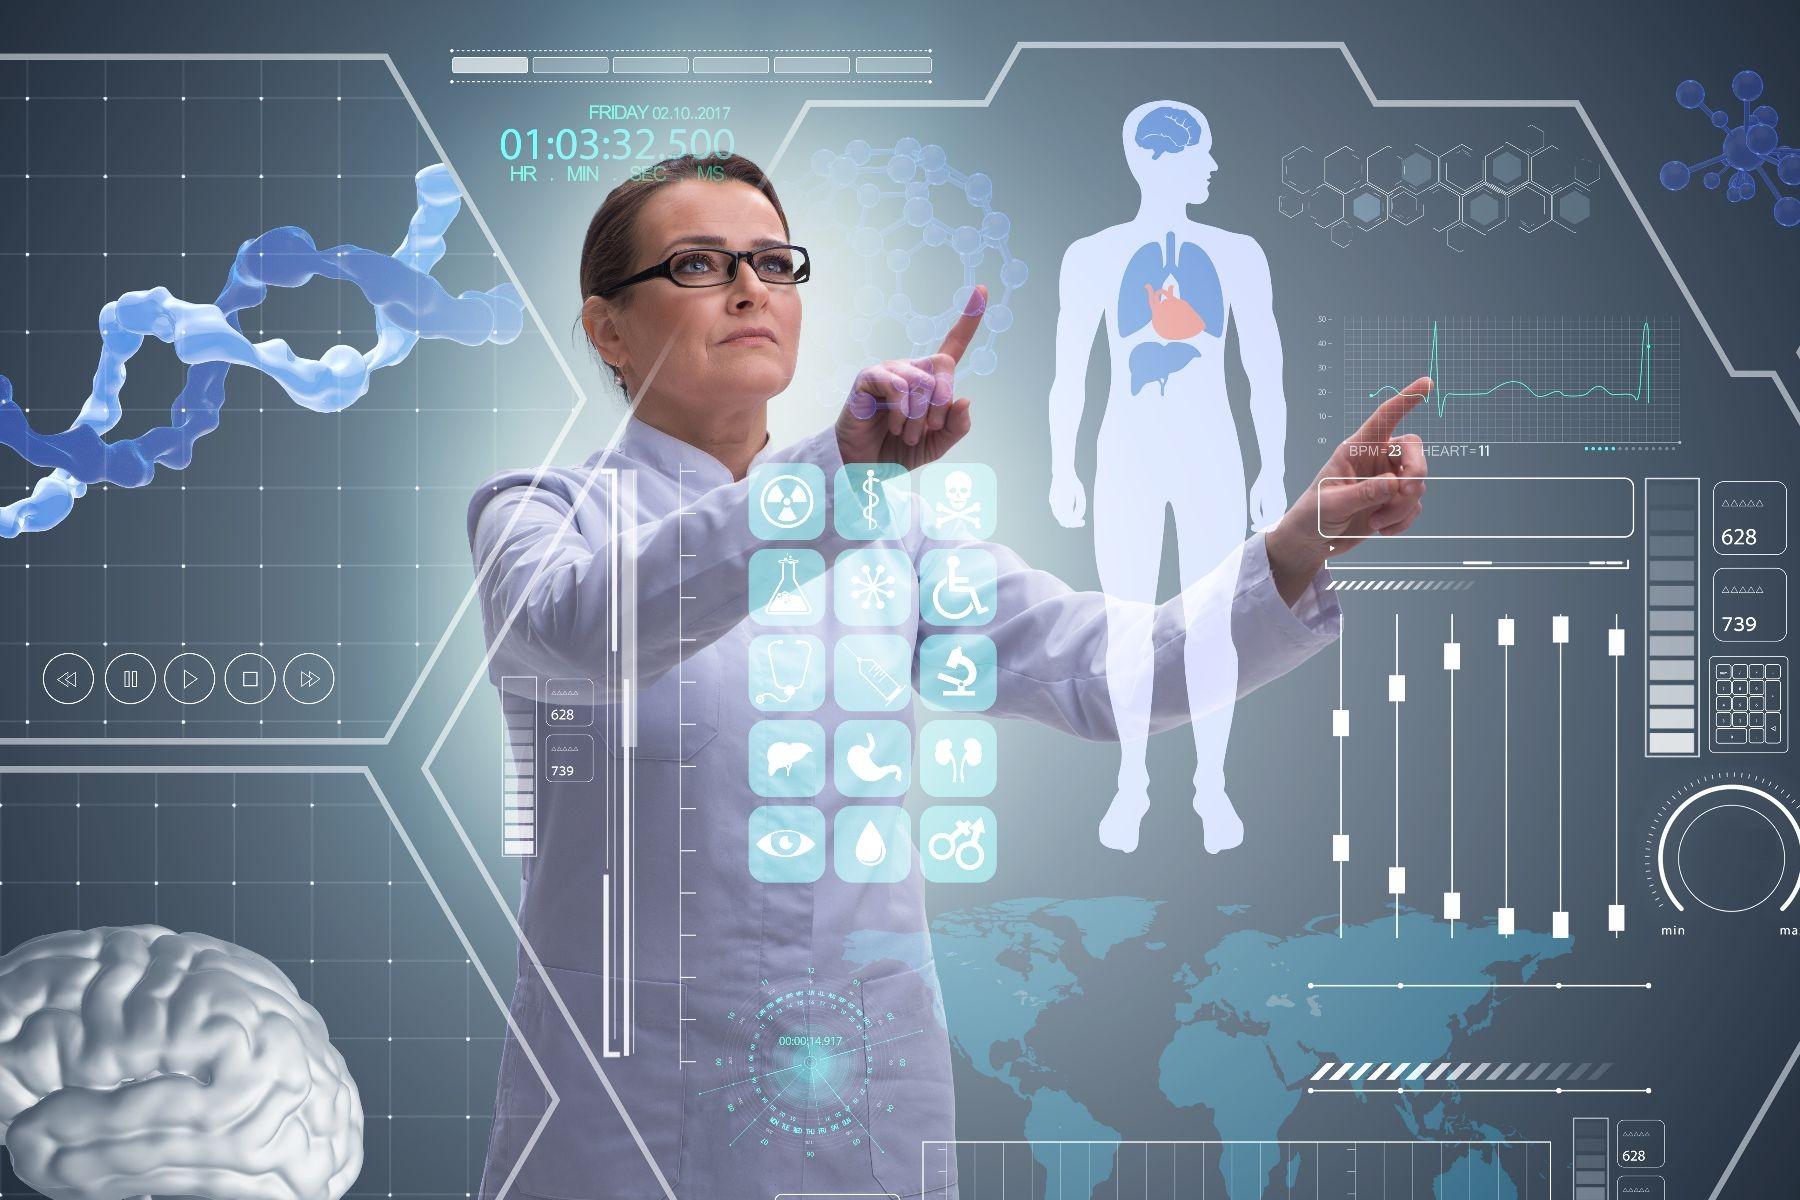 medica observando pantalla de telemedicina